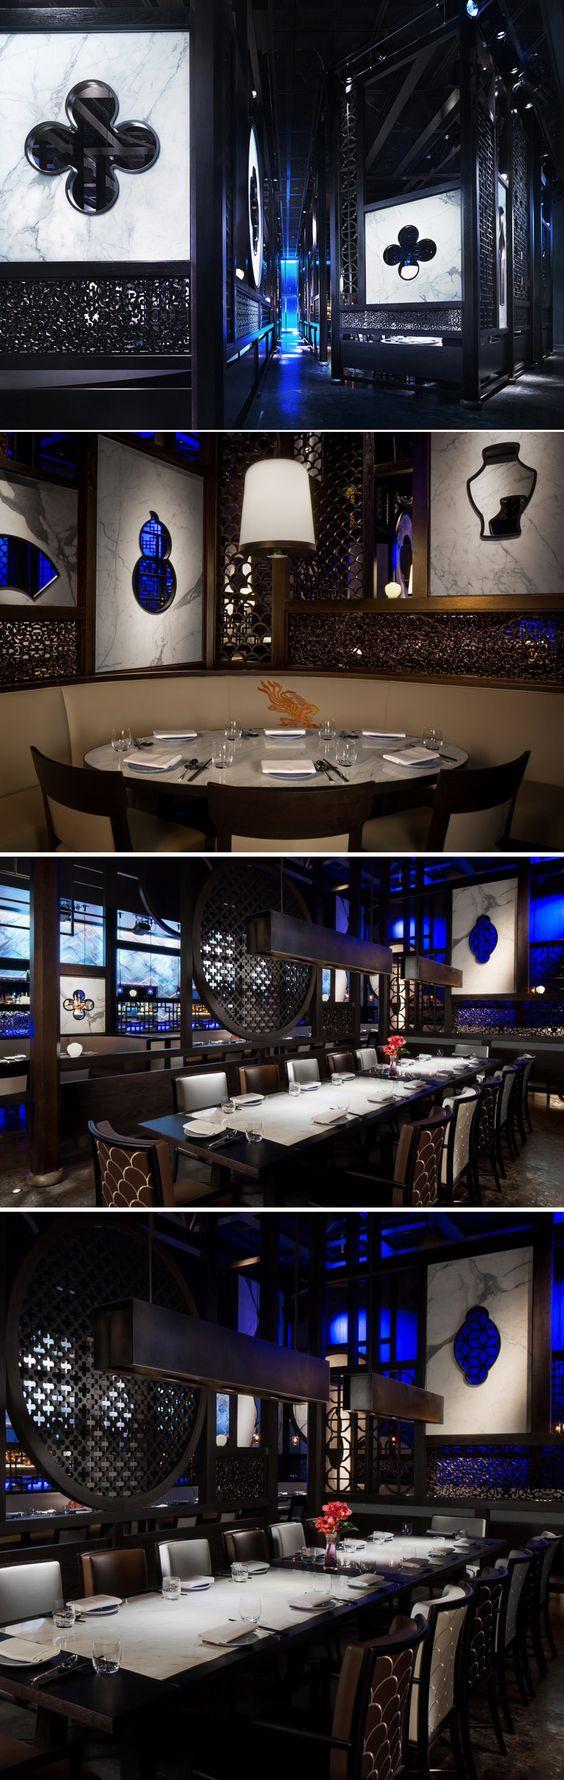 Hakkasan las vegas restaurant and nightclub gilles et